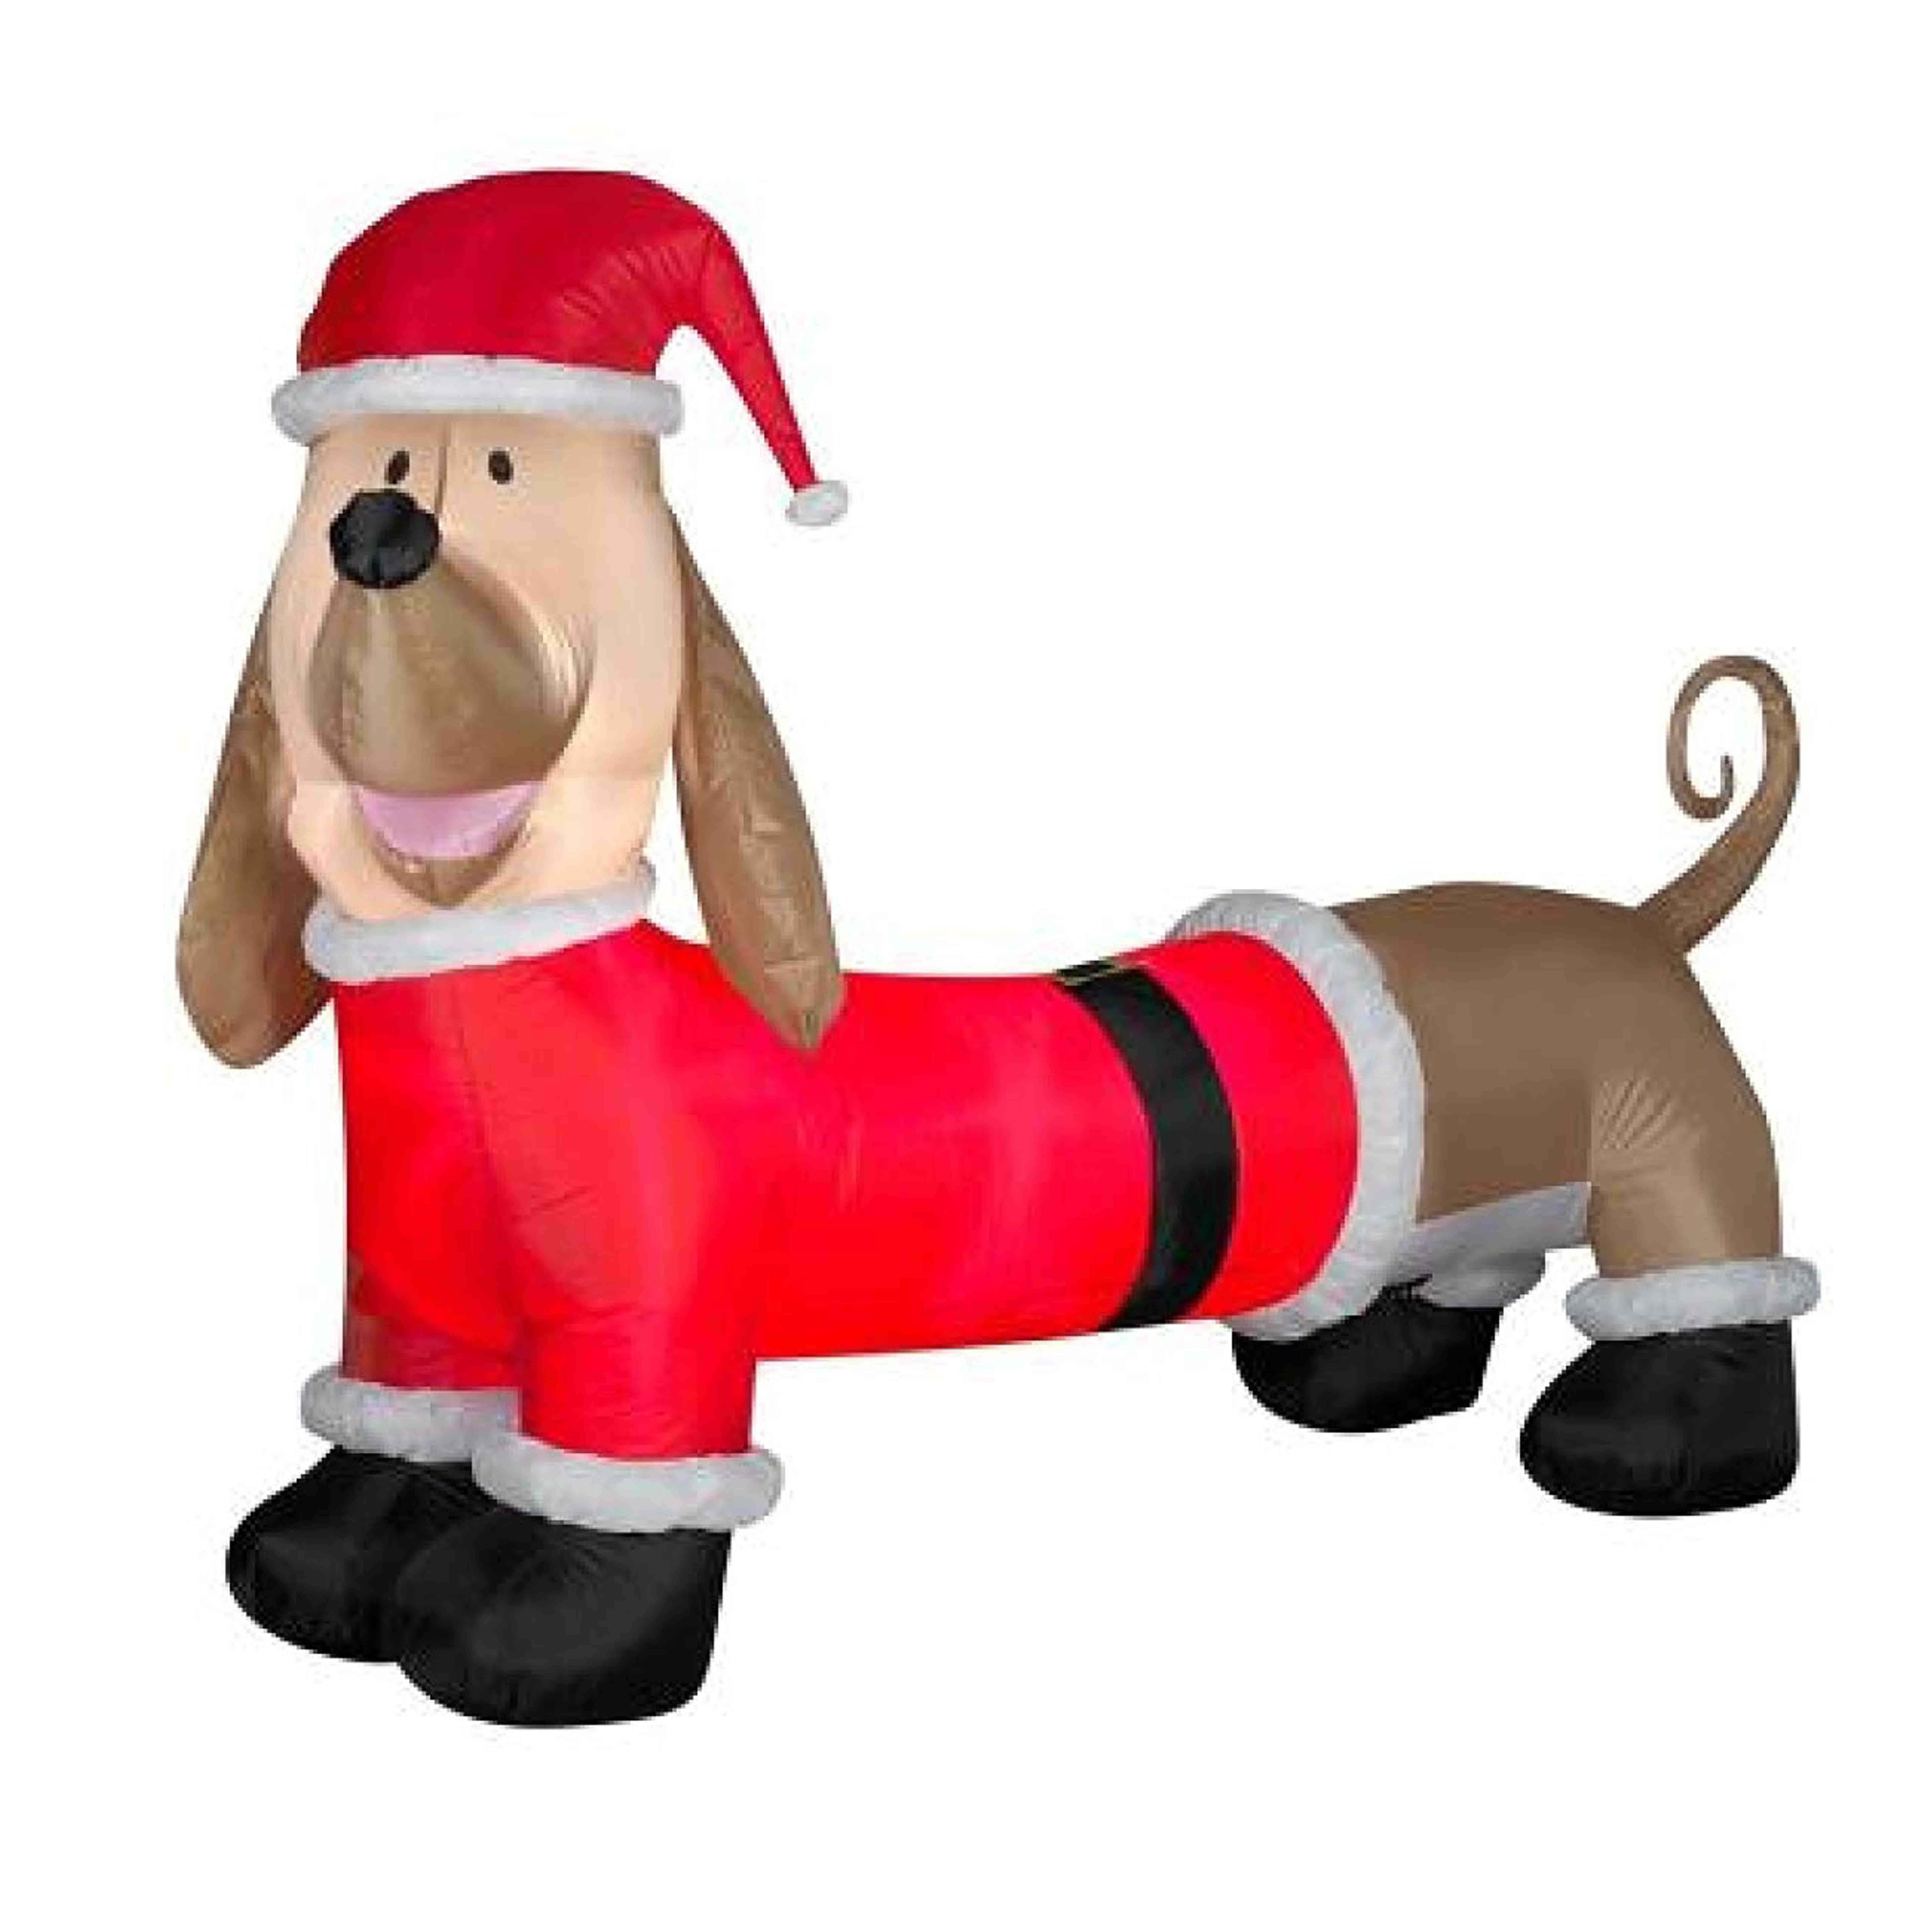 Dachshund Christmas Decoration Airblown Inflatable 6 5 Ft Yard Outdoor Decor Buy Dachshund Christmas Decoration Nflatable 6 5 Ft Yard Outdoor Decor Lowes Outdoor Christmas Decorations Product On Alibaba Com